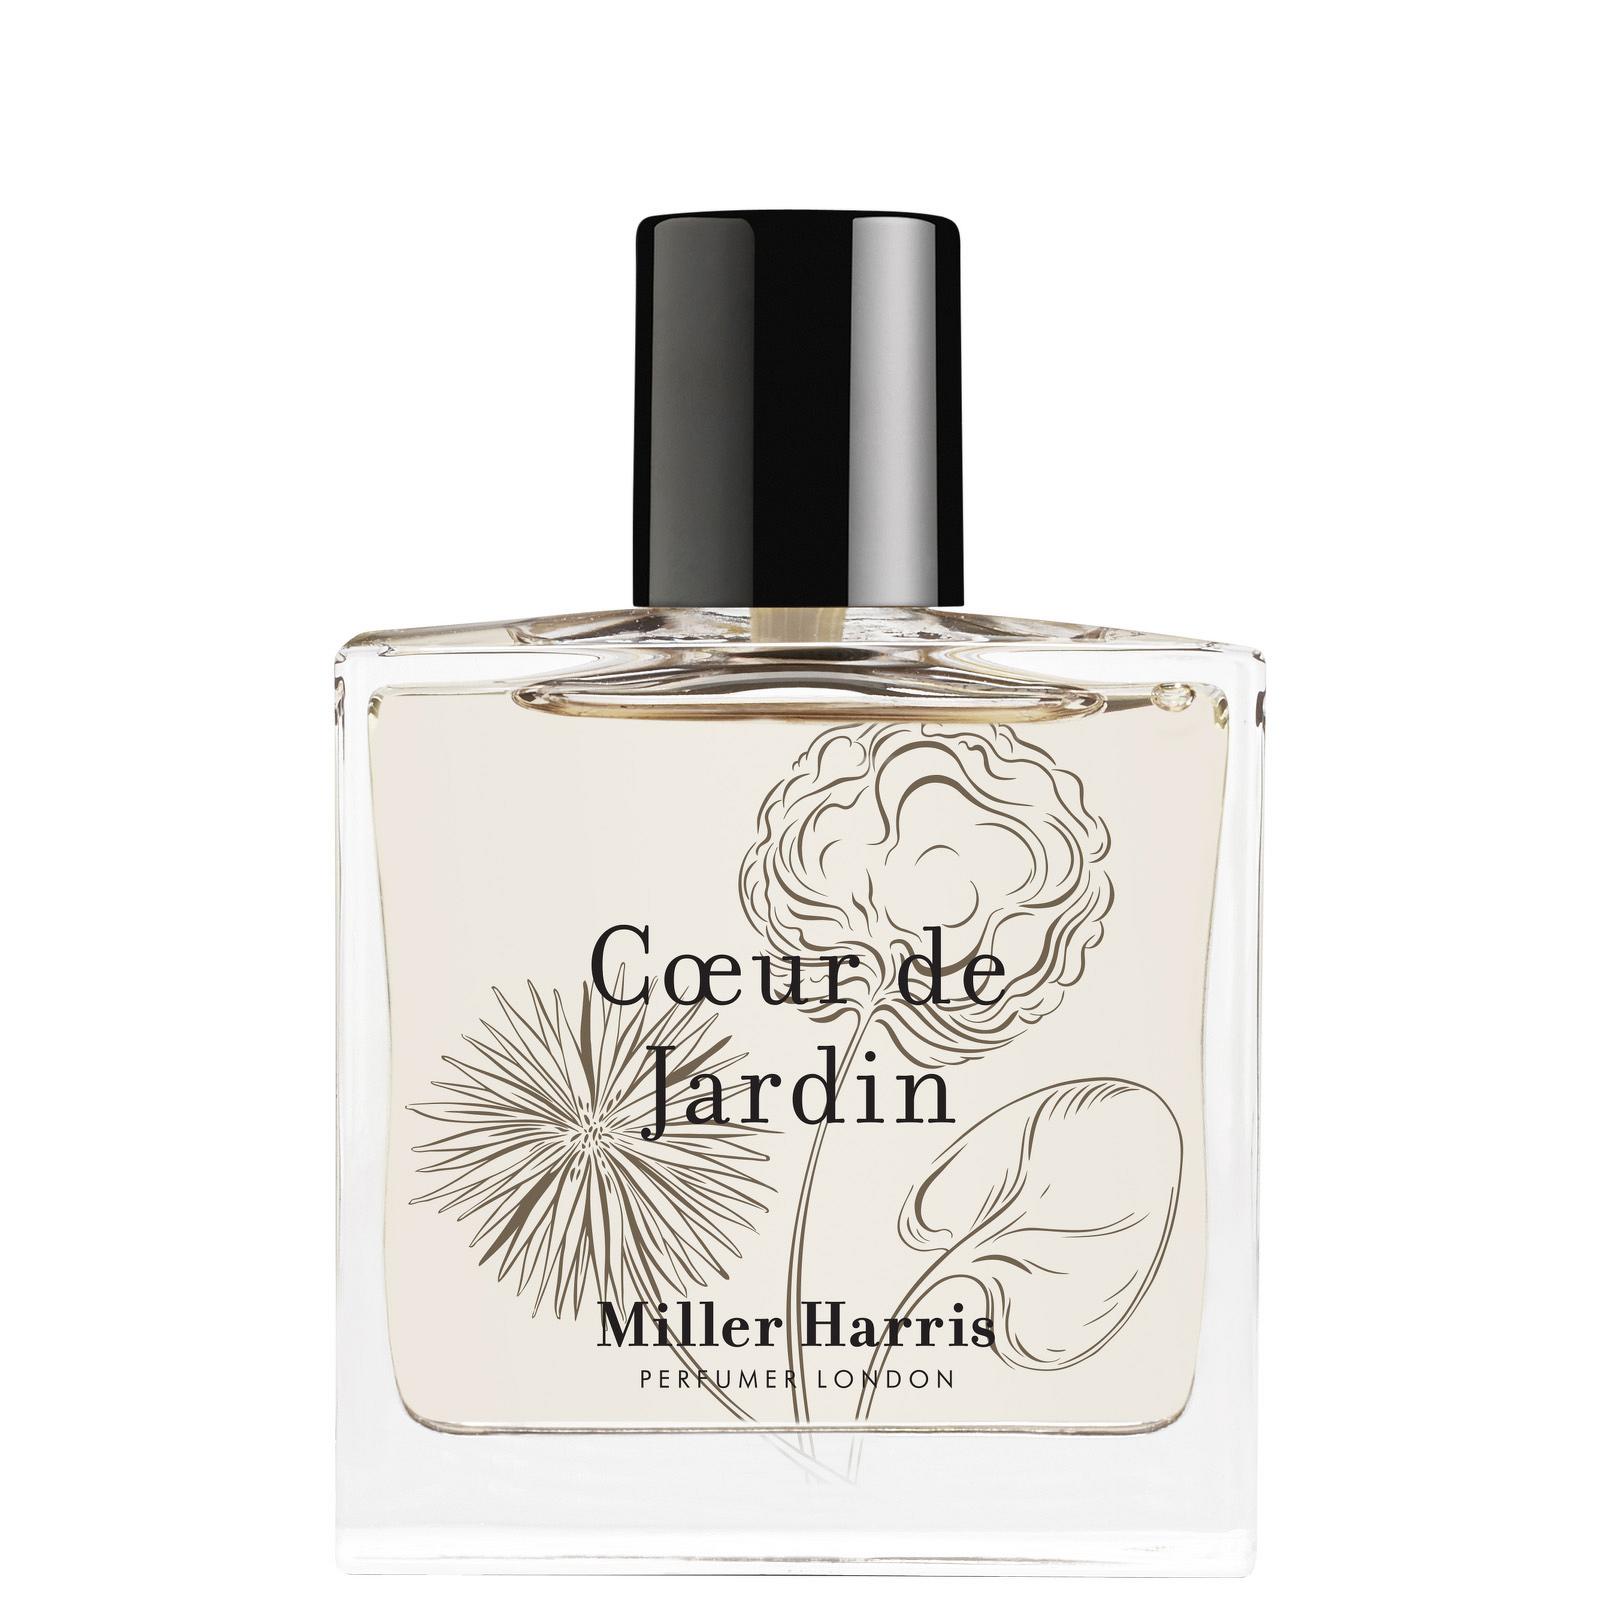 MILLER HARRIS Coeur De Jardin EDP 50ml £26.98 click and collect @ tk maxx